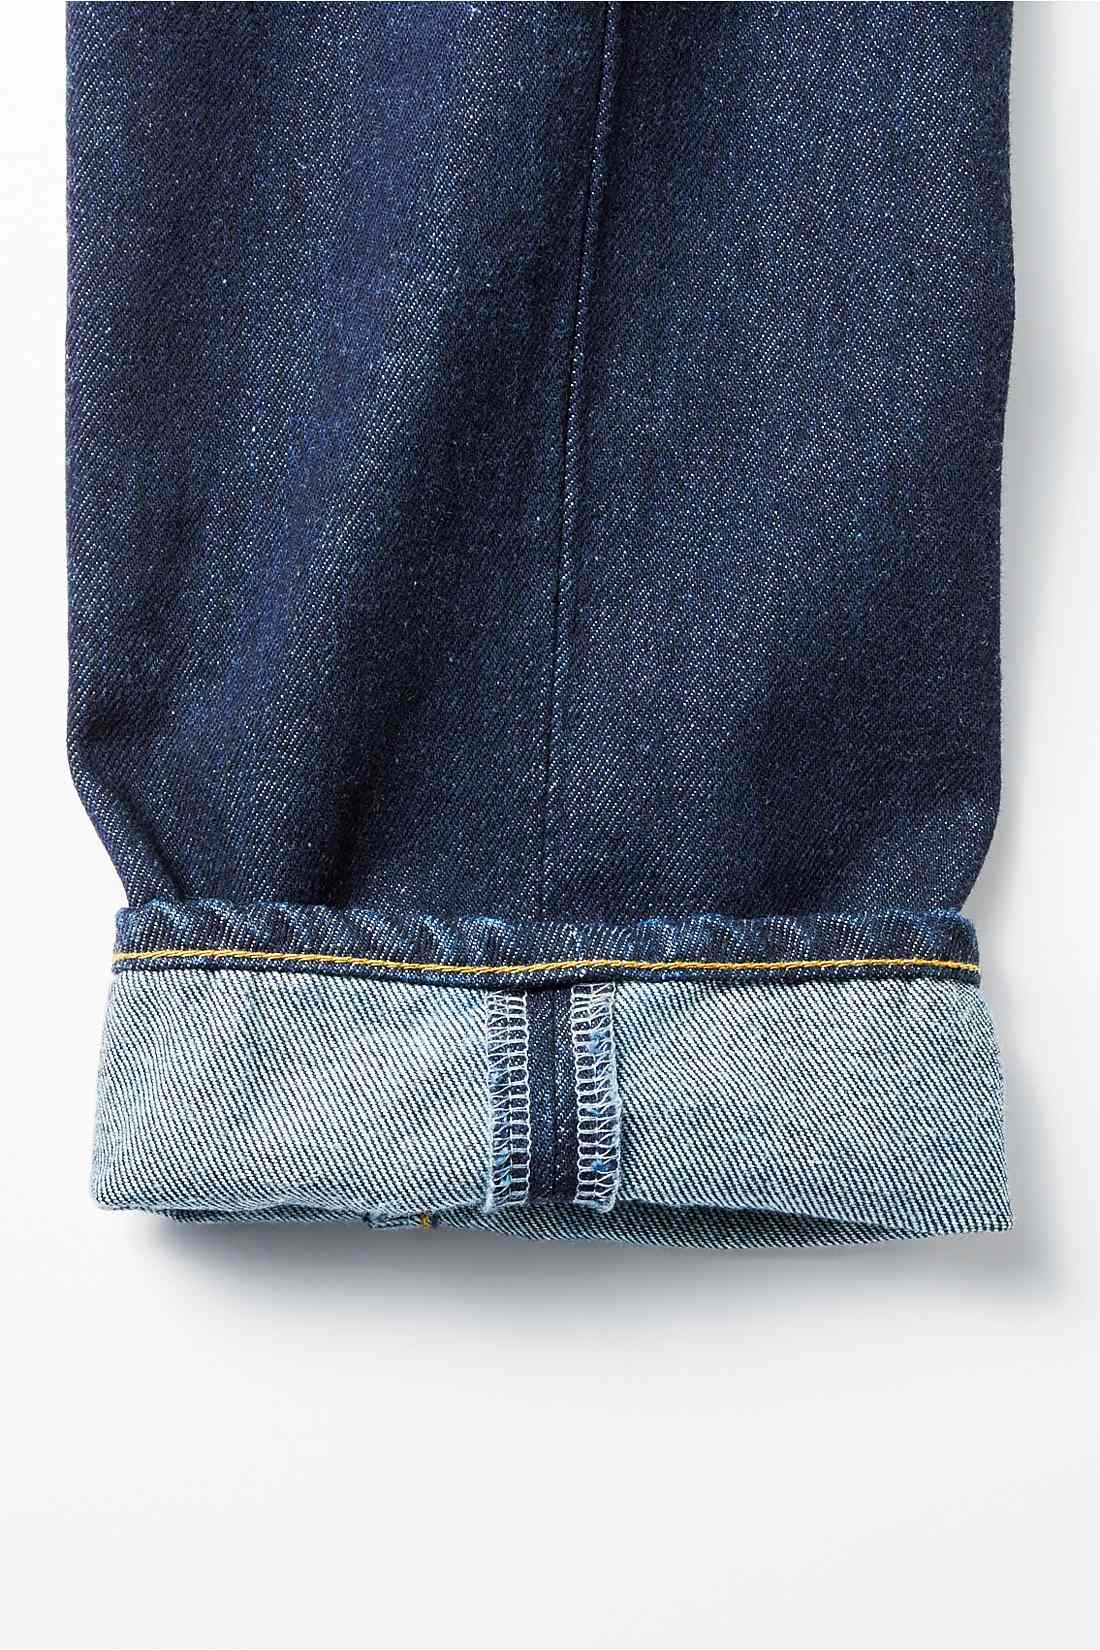 THREE FIFTY STANDARD スタンダード5ポケットジーンズ